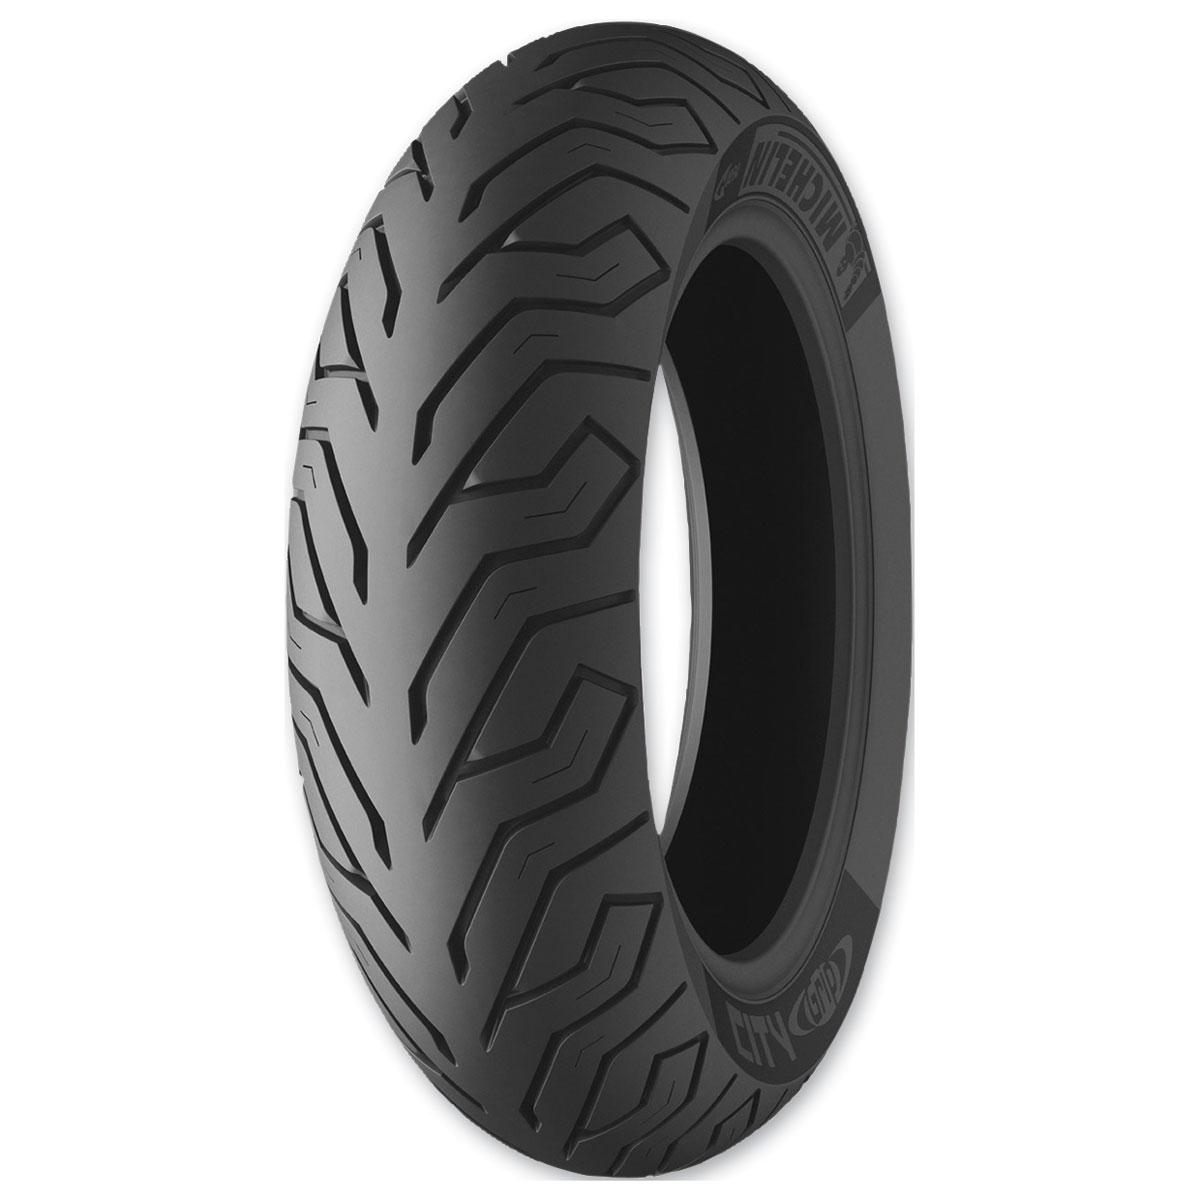 Michelin CITY GRIP 100/80-10 Front/Rear Tire